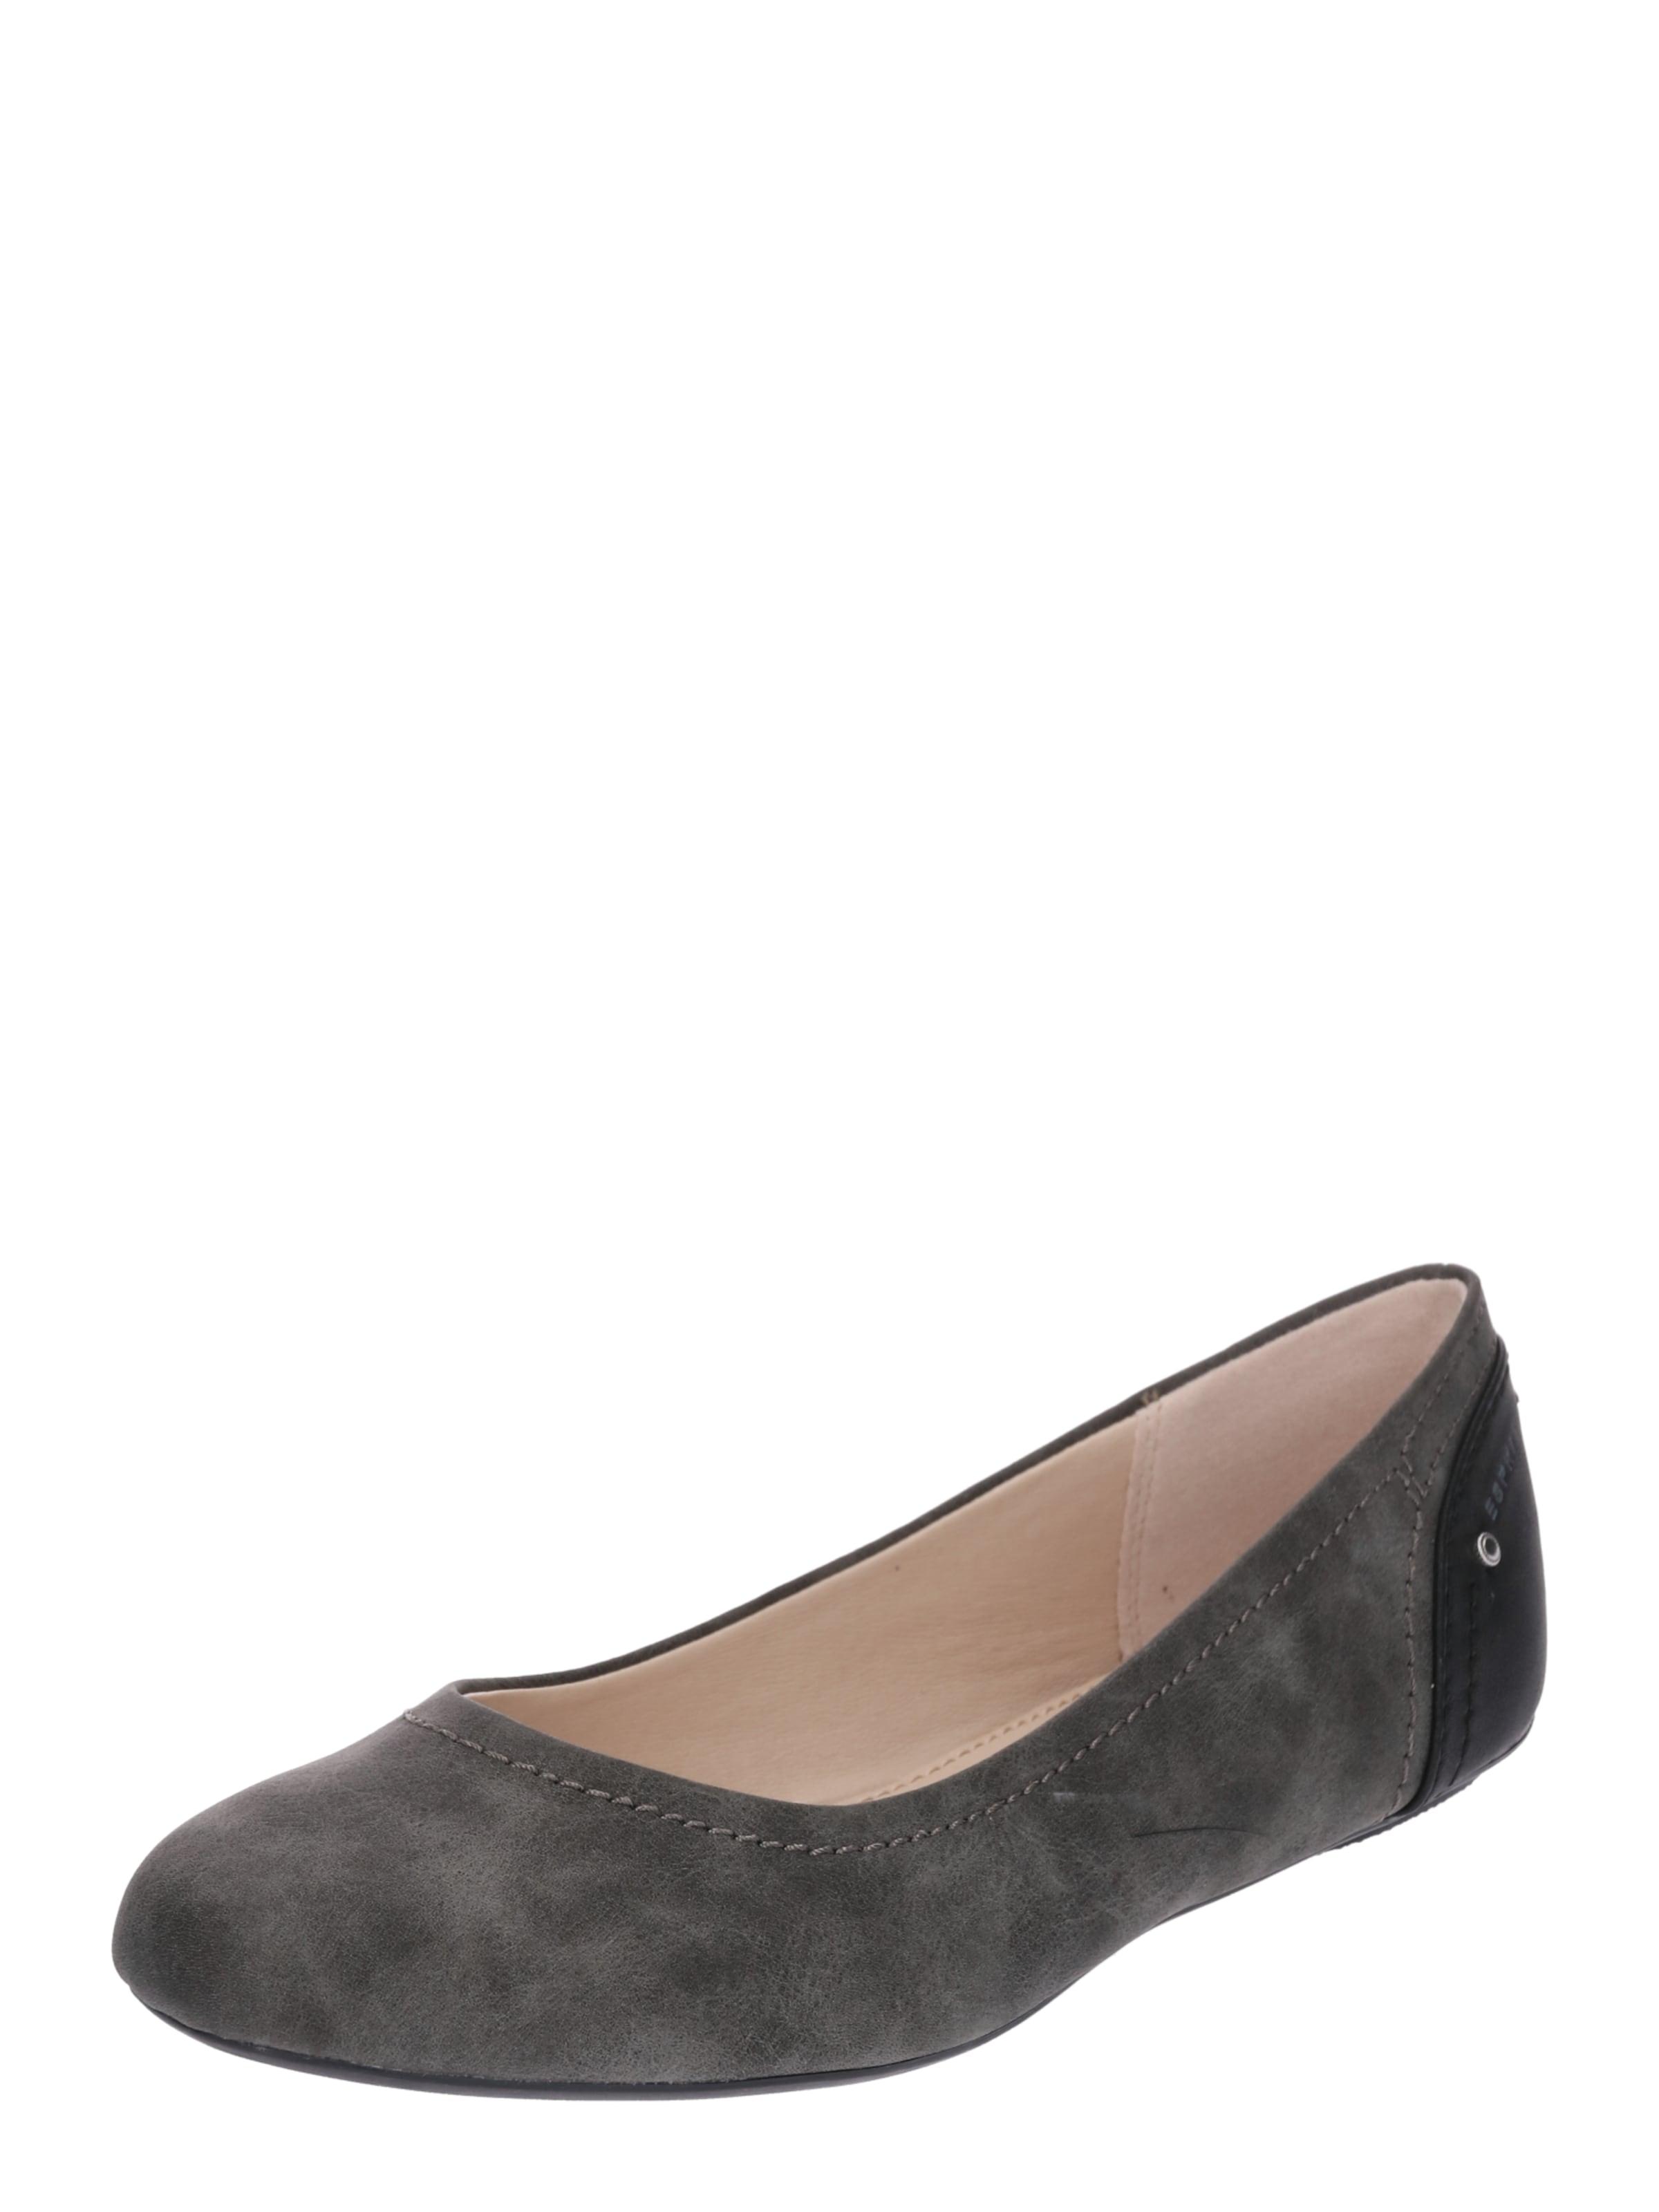 Haltbare Mode billige Schuhe ESPRIT | Ballerina 'Aloa' Schuhe Gut getragene Schuhe